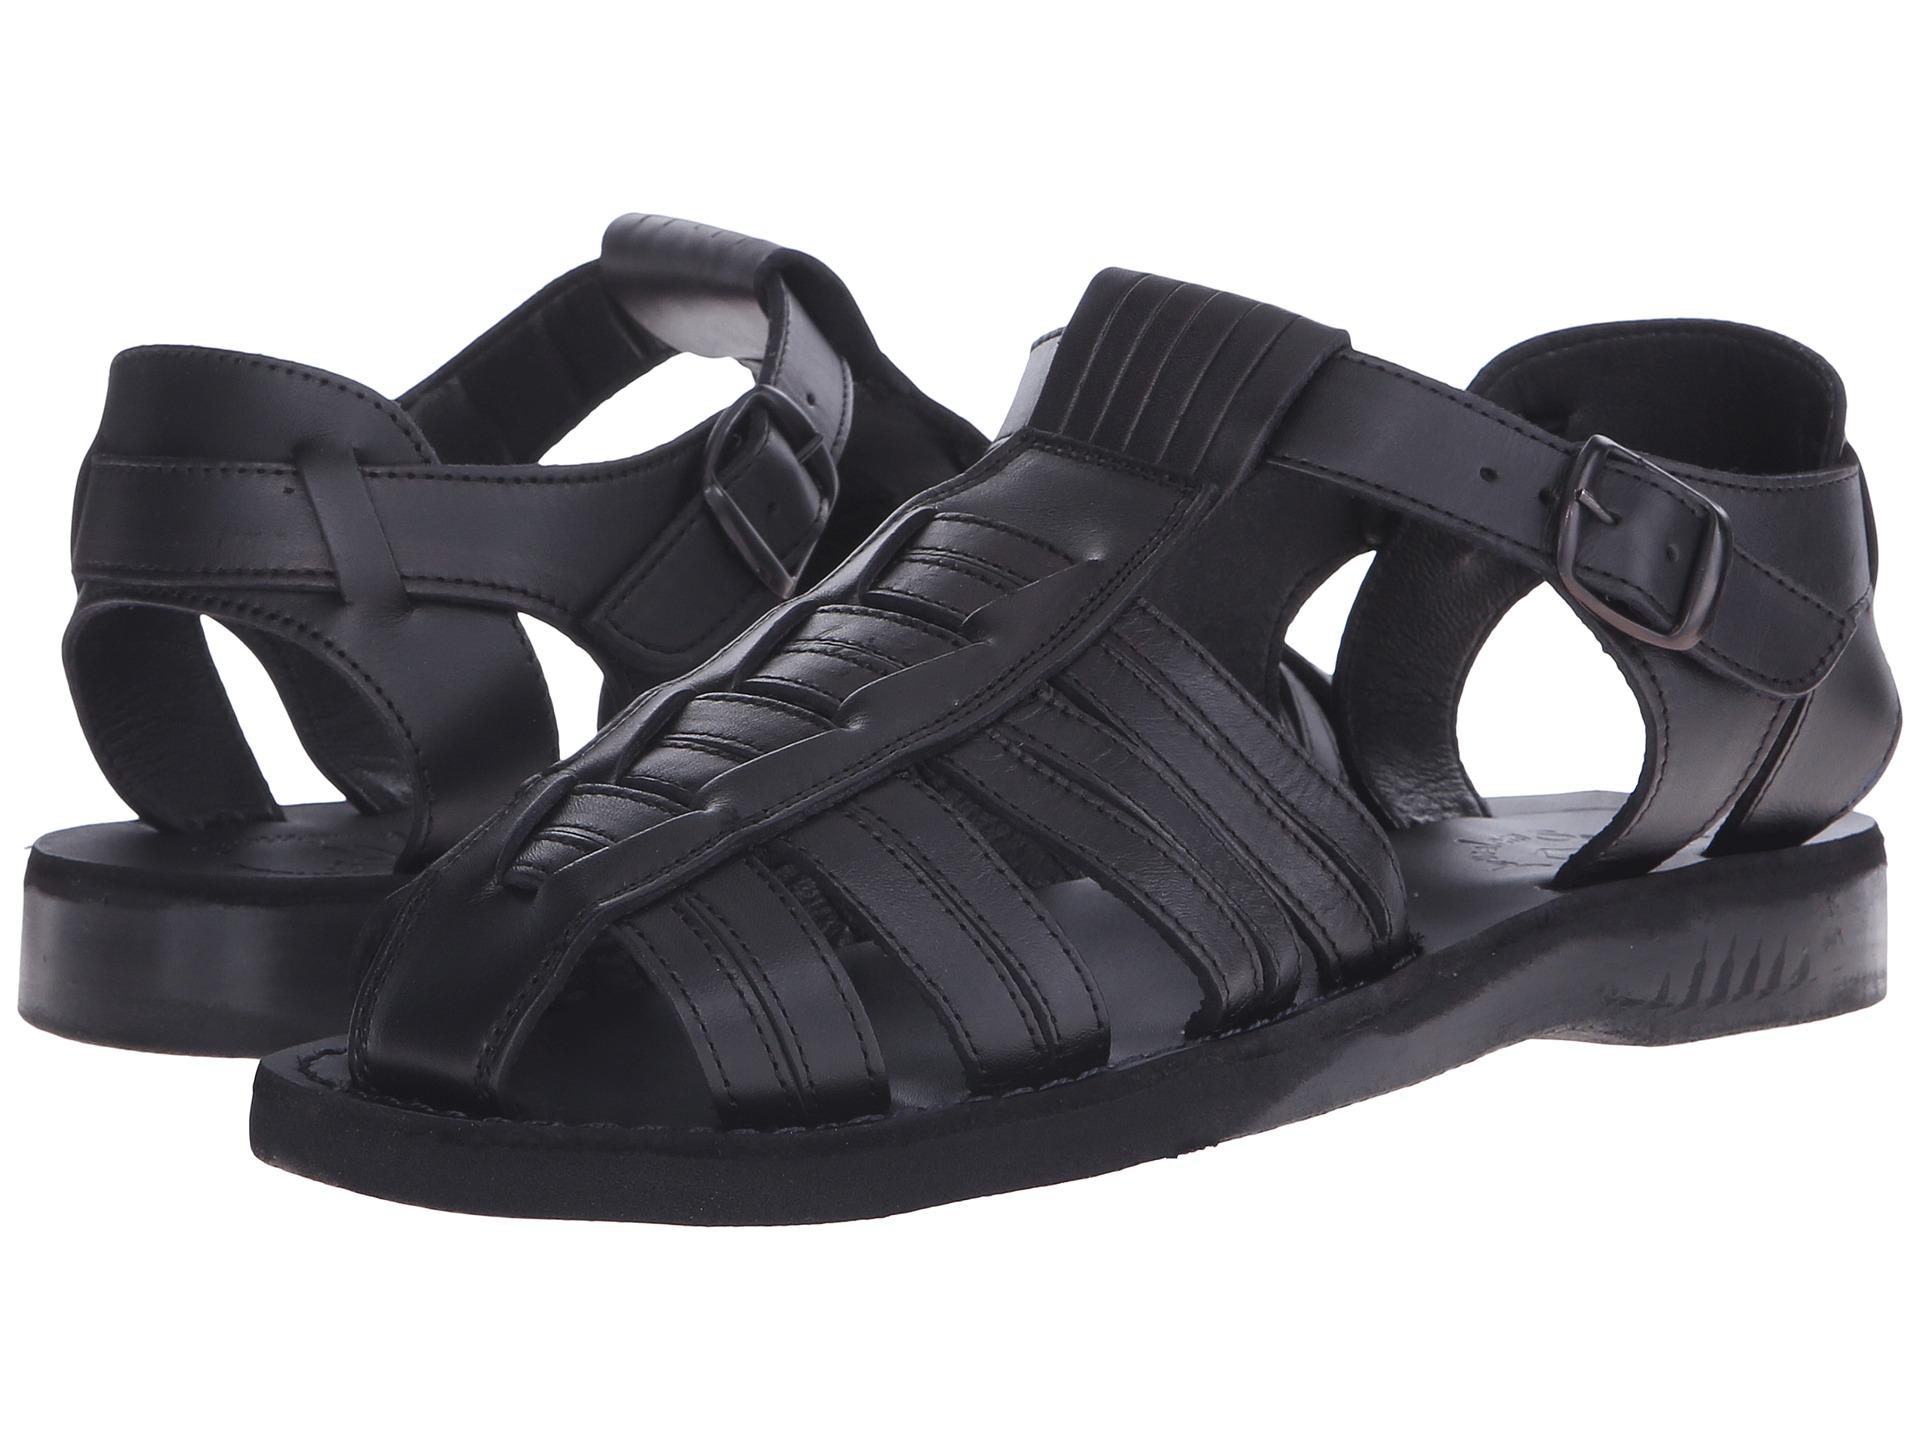 Sandals in black - View More Like This Jerusalem Sandals Barak Mens